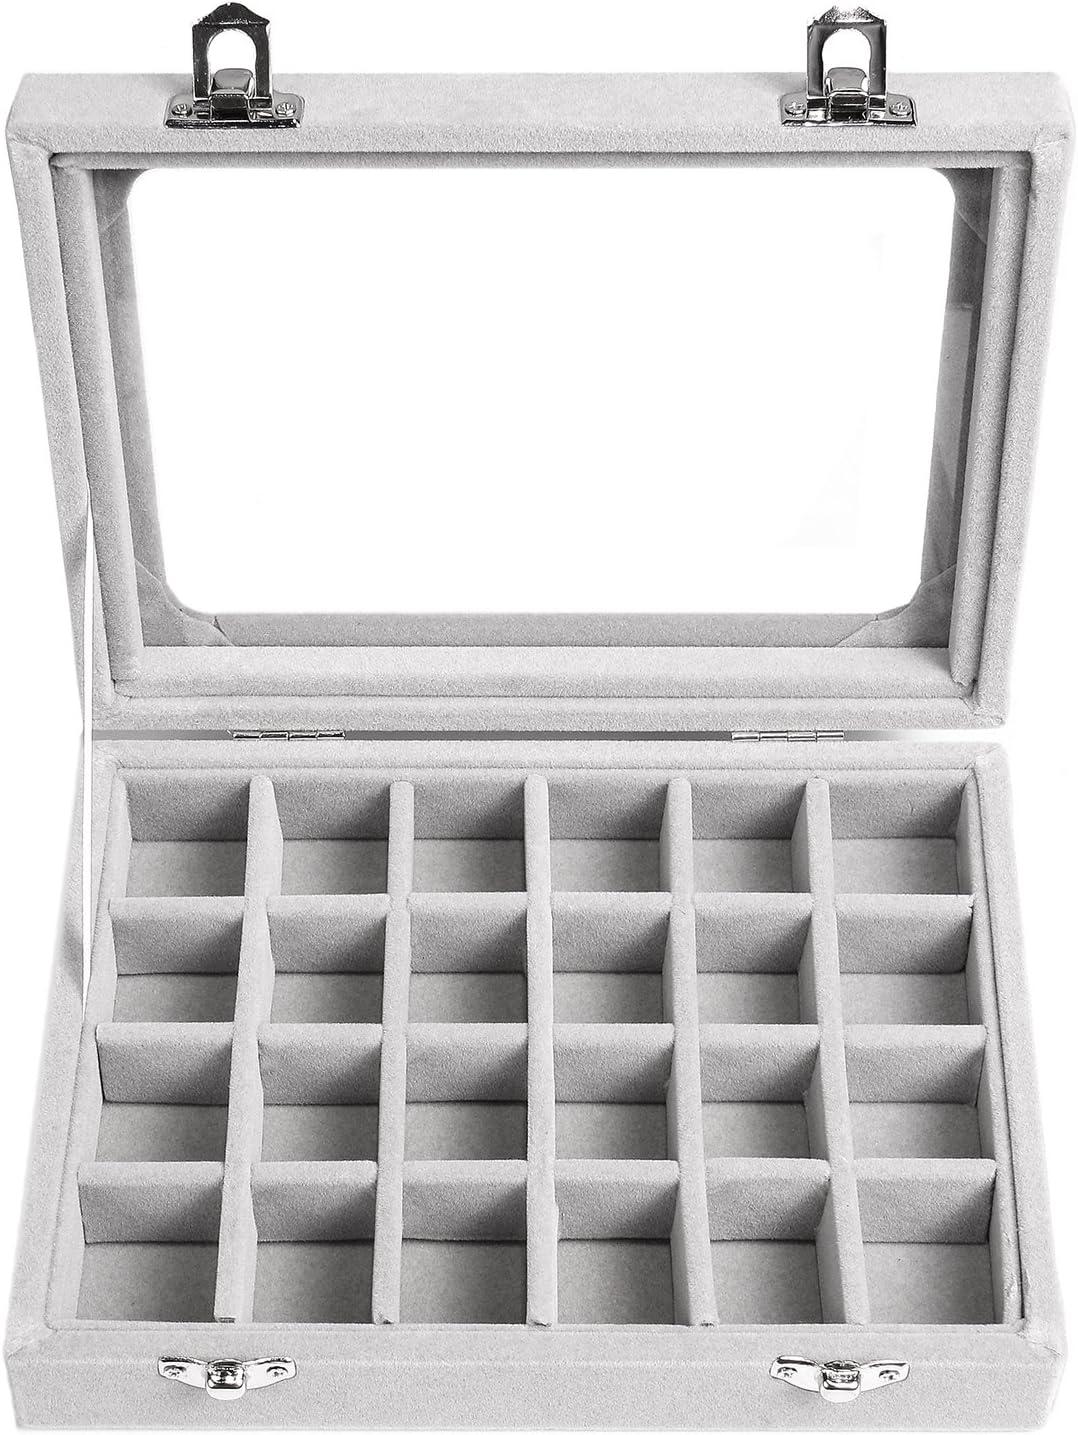 Velvet Compartment Ring Jewelry Tray Drawer Organizer Storage Case Box24 Slot